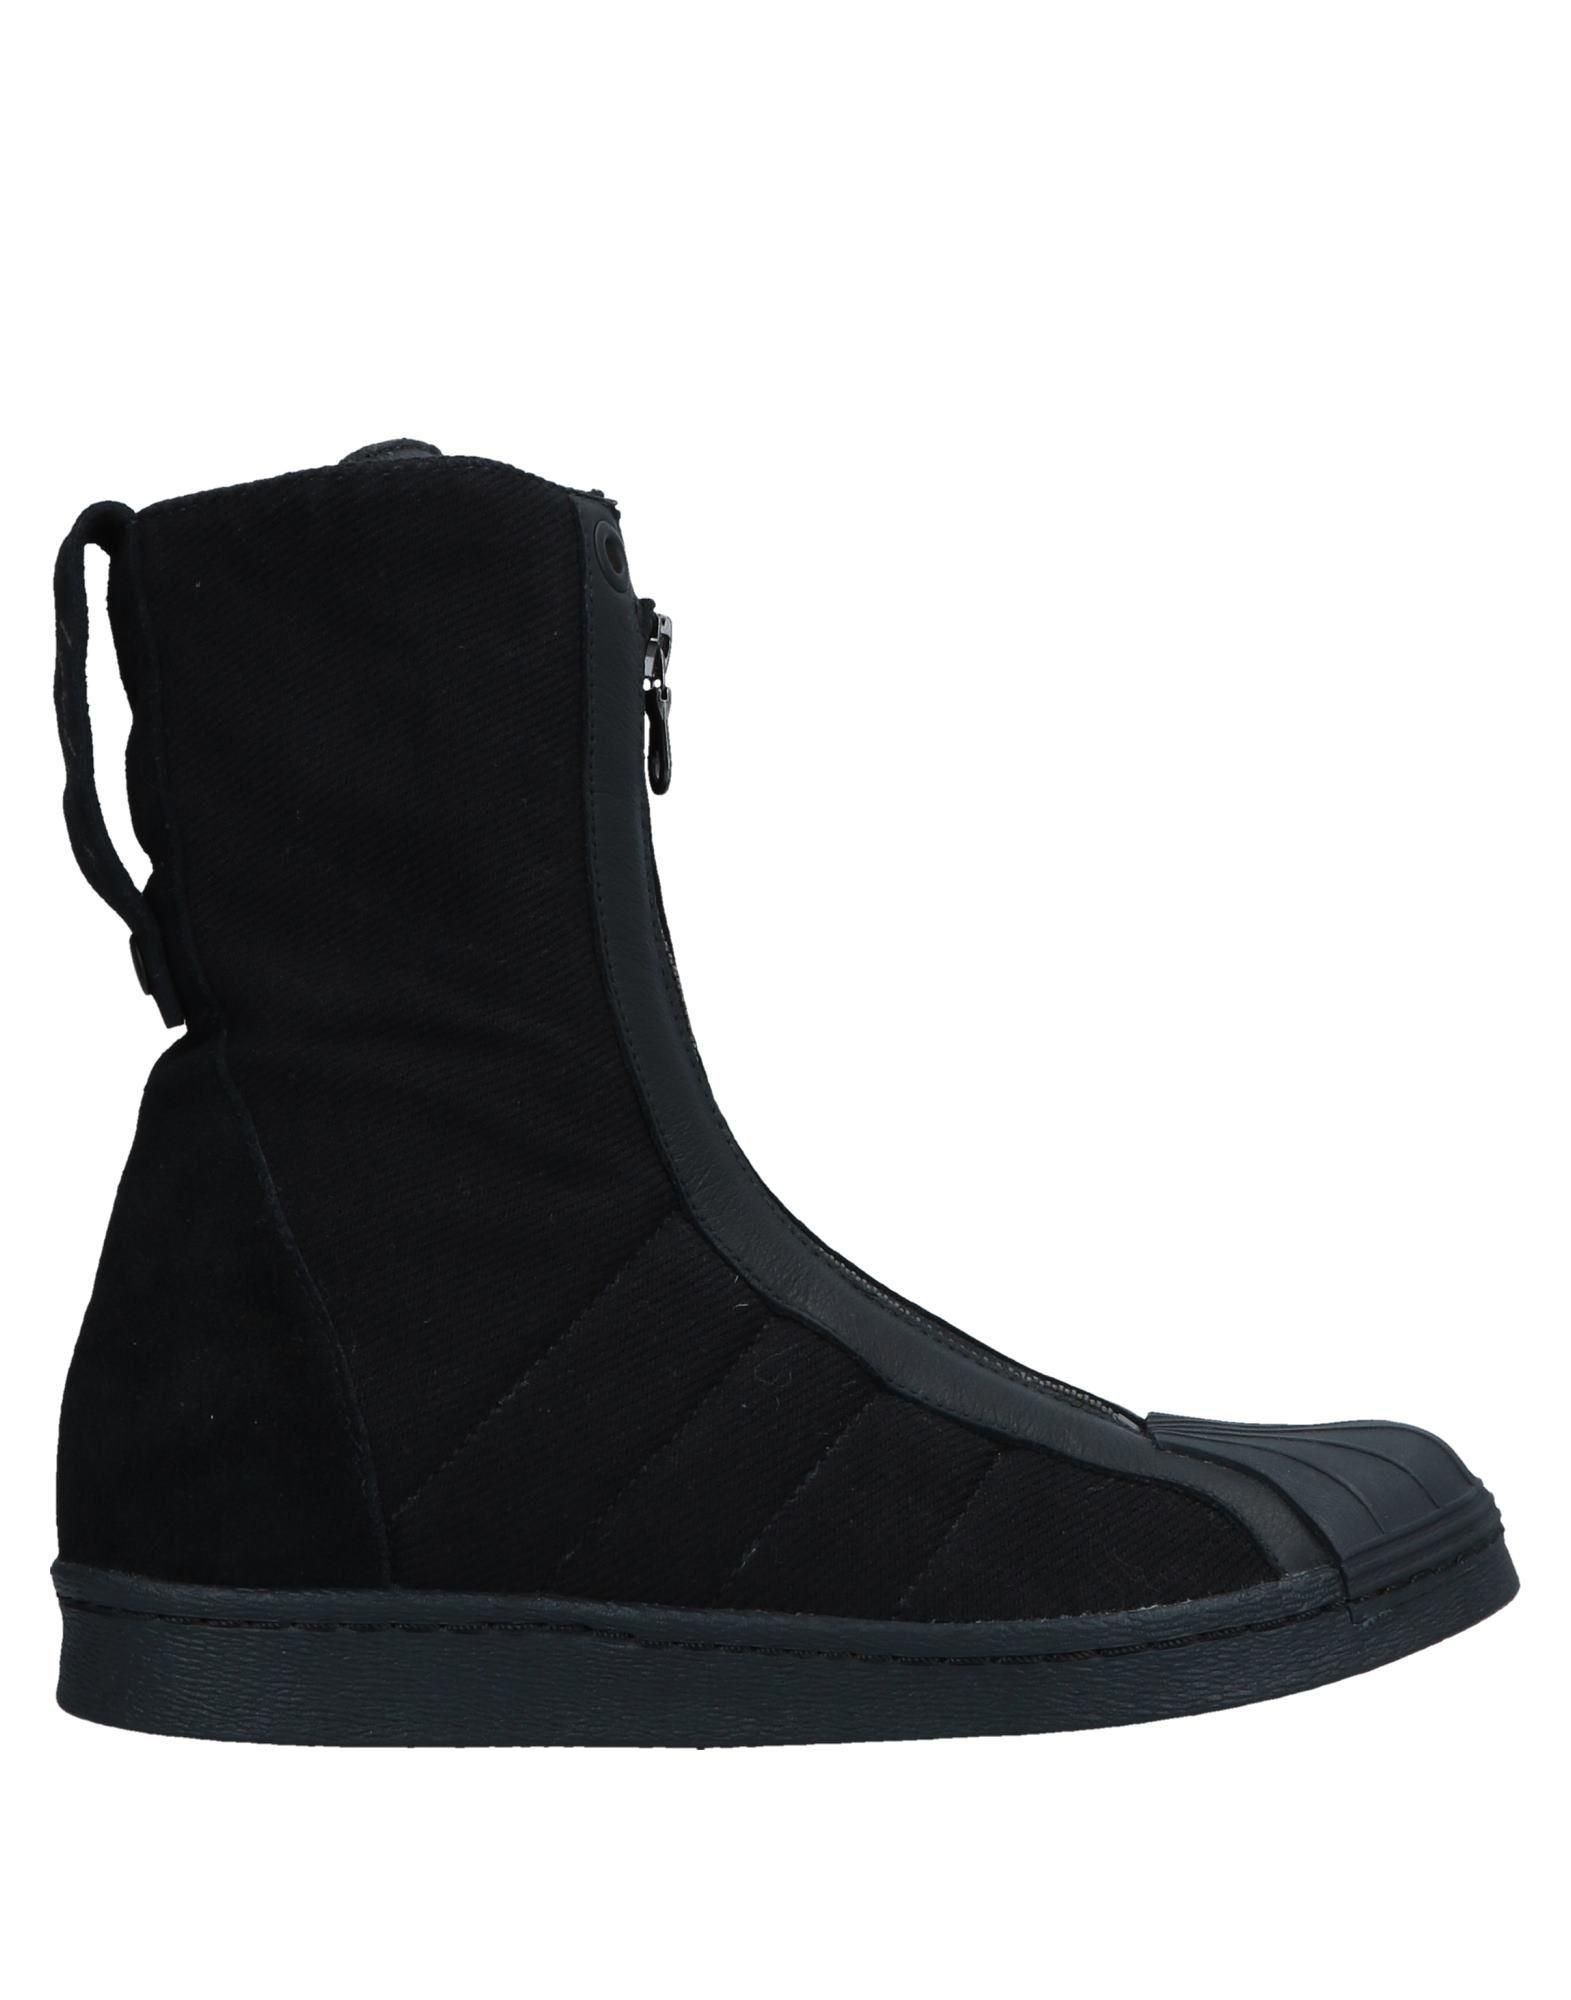 ADIDAS by YOHJI YAMAMOTO Полусапоги и высокие ботинки esveva 2018 women boots slim look boots square high heel round toe over the knee boots pointed toe sexy ladies boots size 34 43